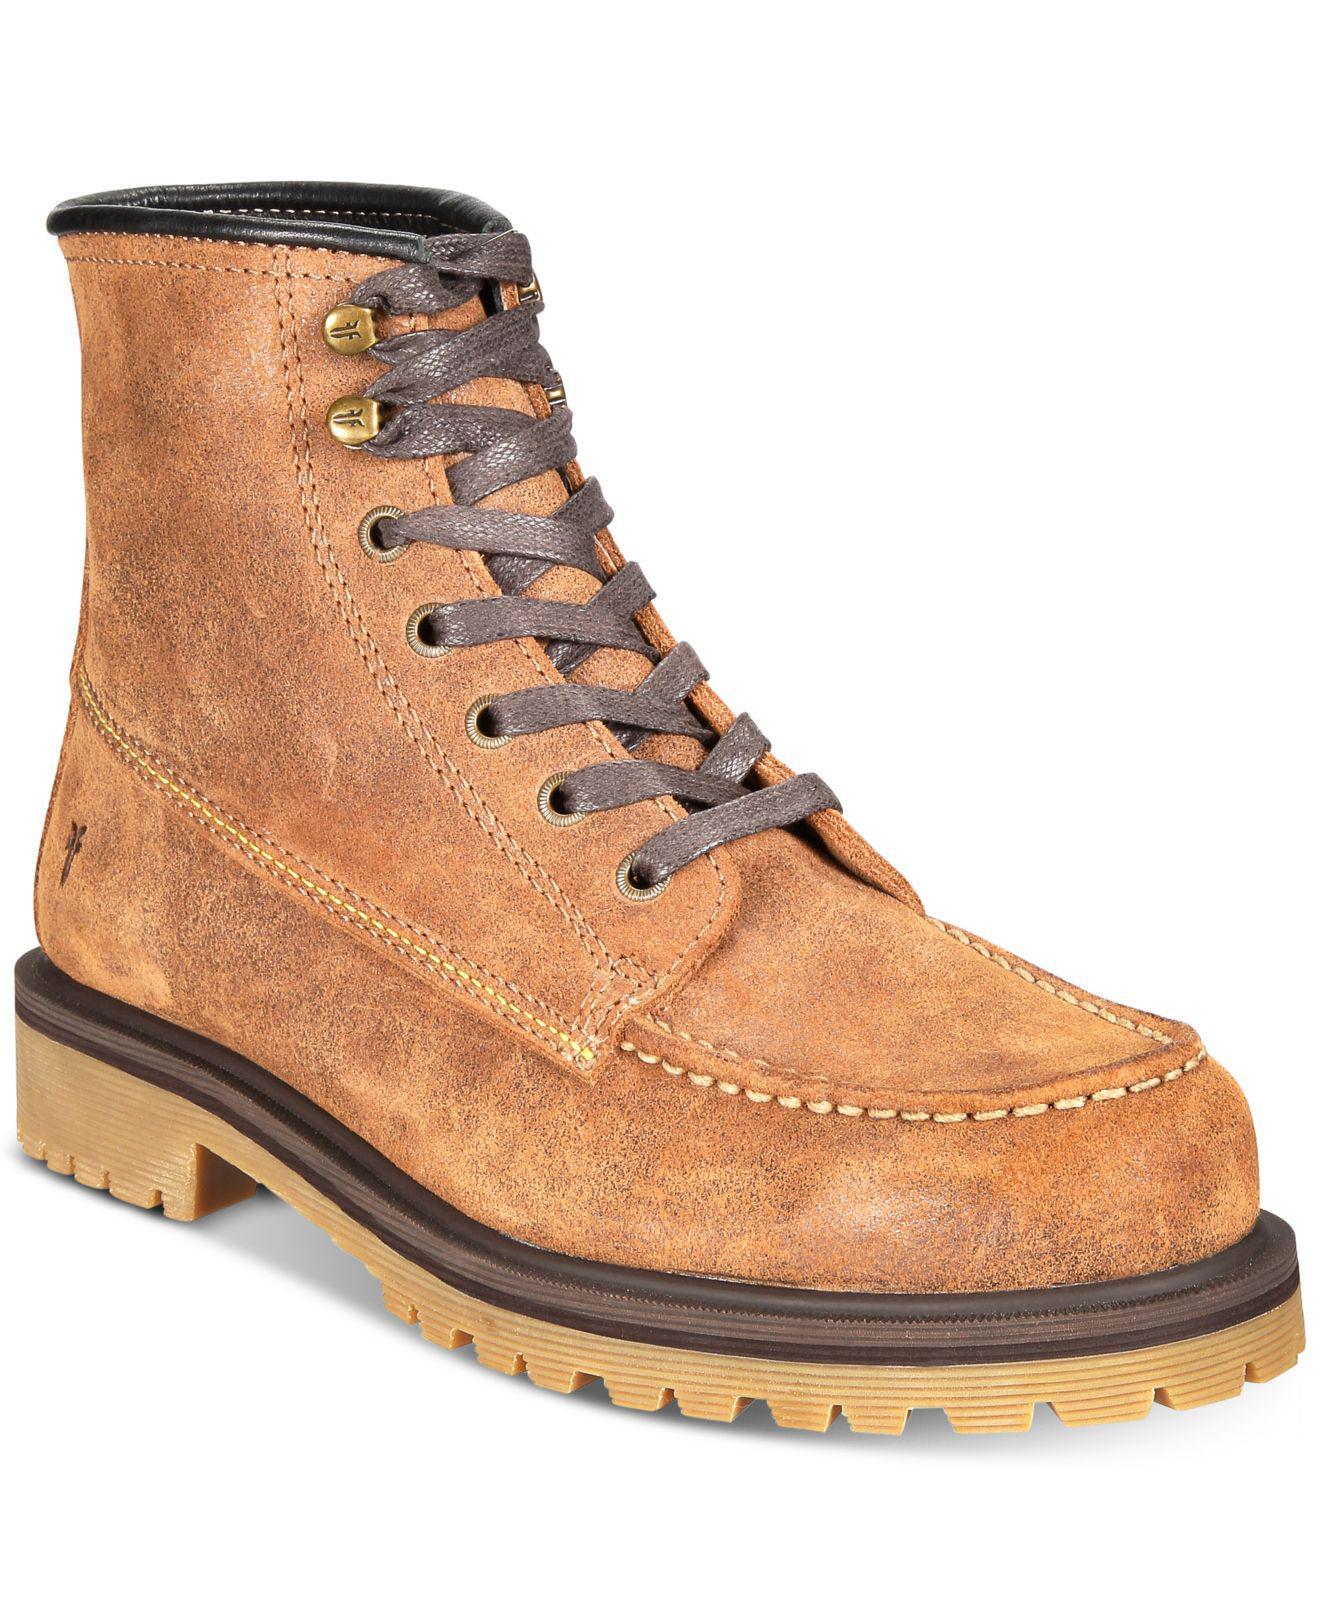 d0db060cc5f4f Frye. Men s Brown Pine Lug Leather Work Boots ...